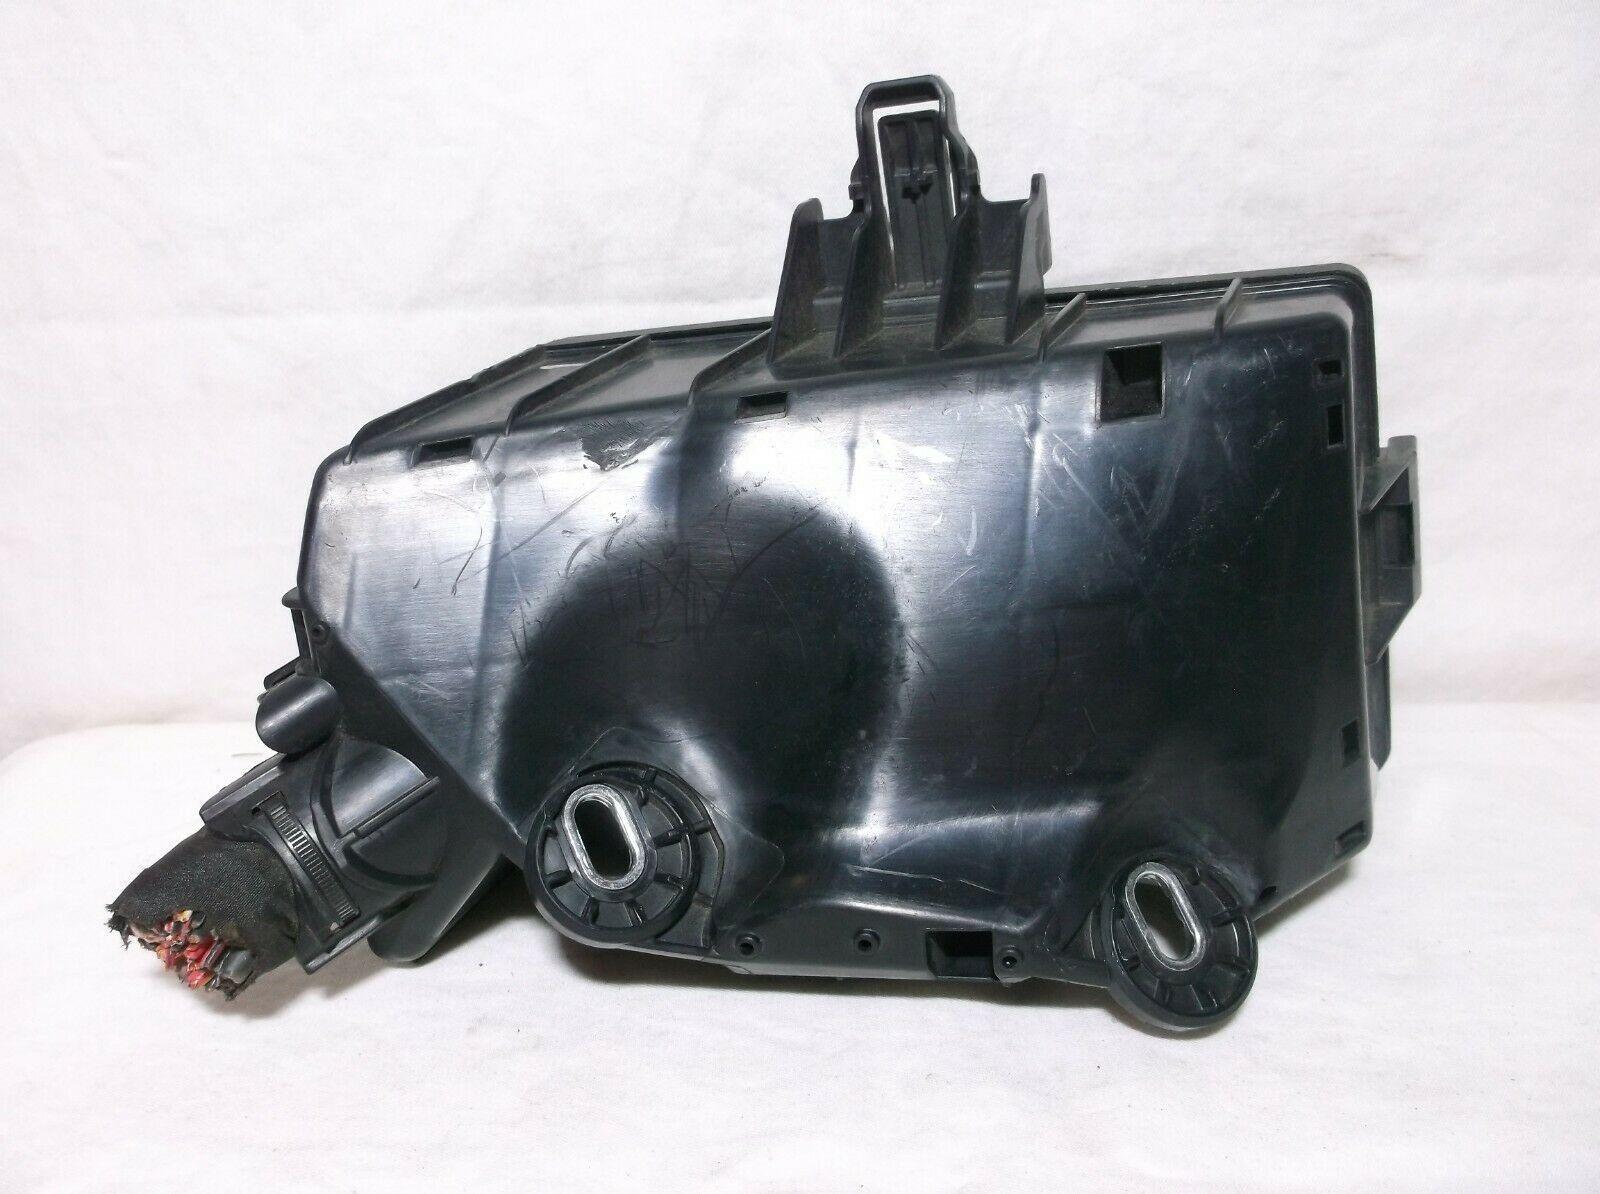 15-16-17 Volkswagen  Vw Golf   Gti   Fuse   Relay   Box